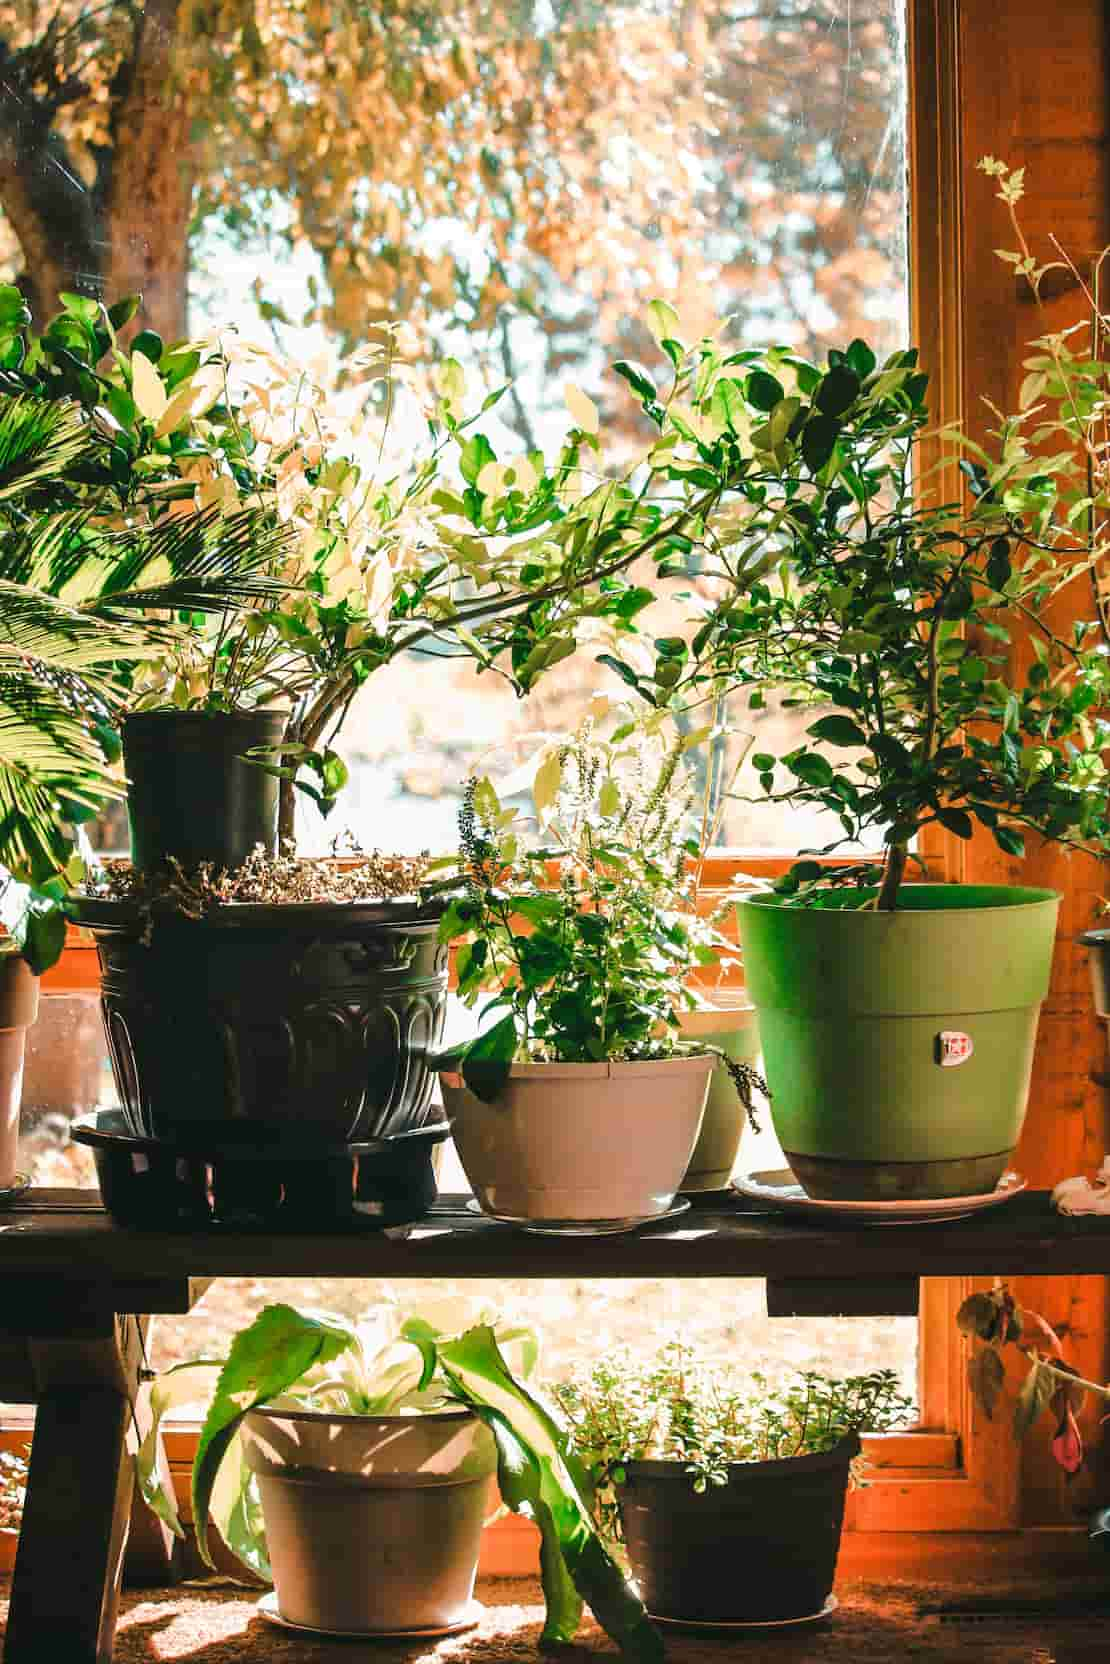 Prepare-garden-for-house-veiwing